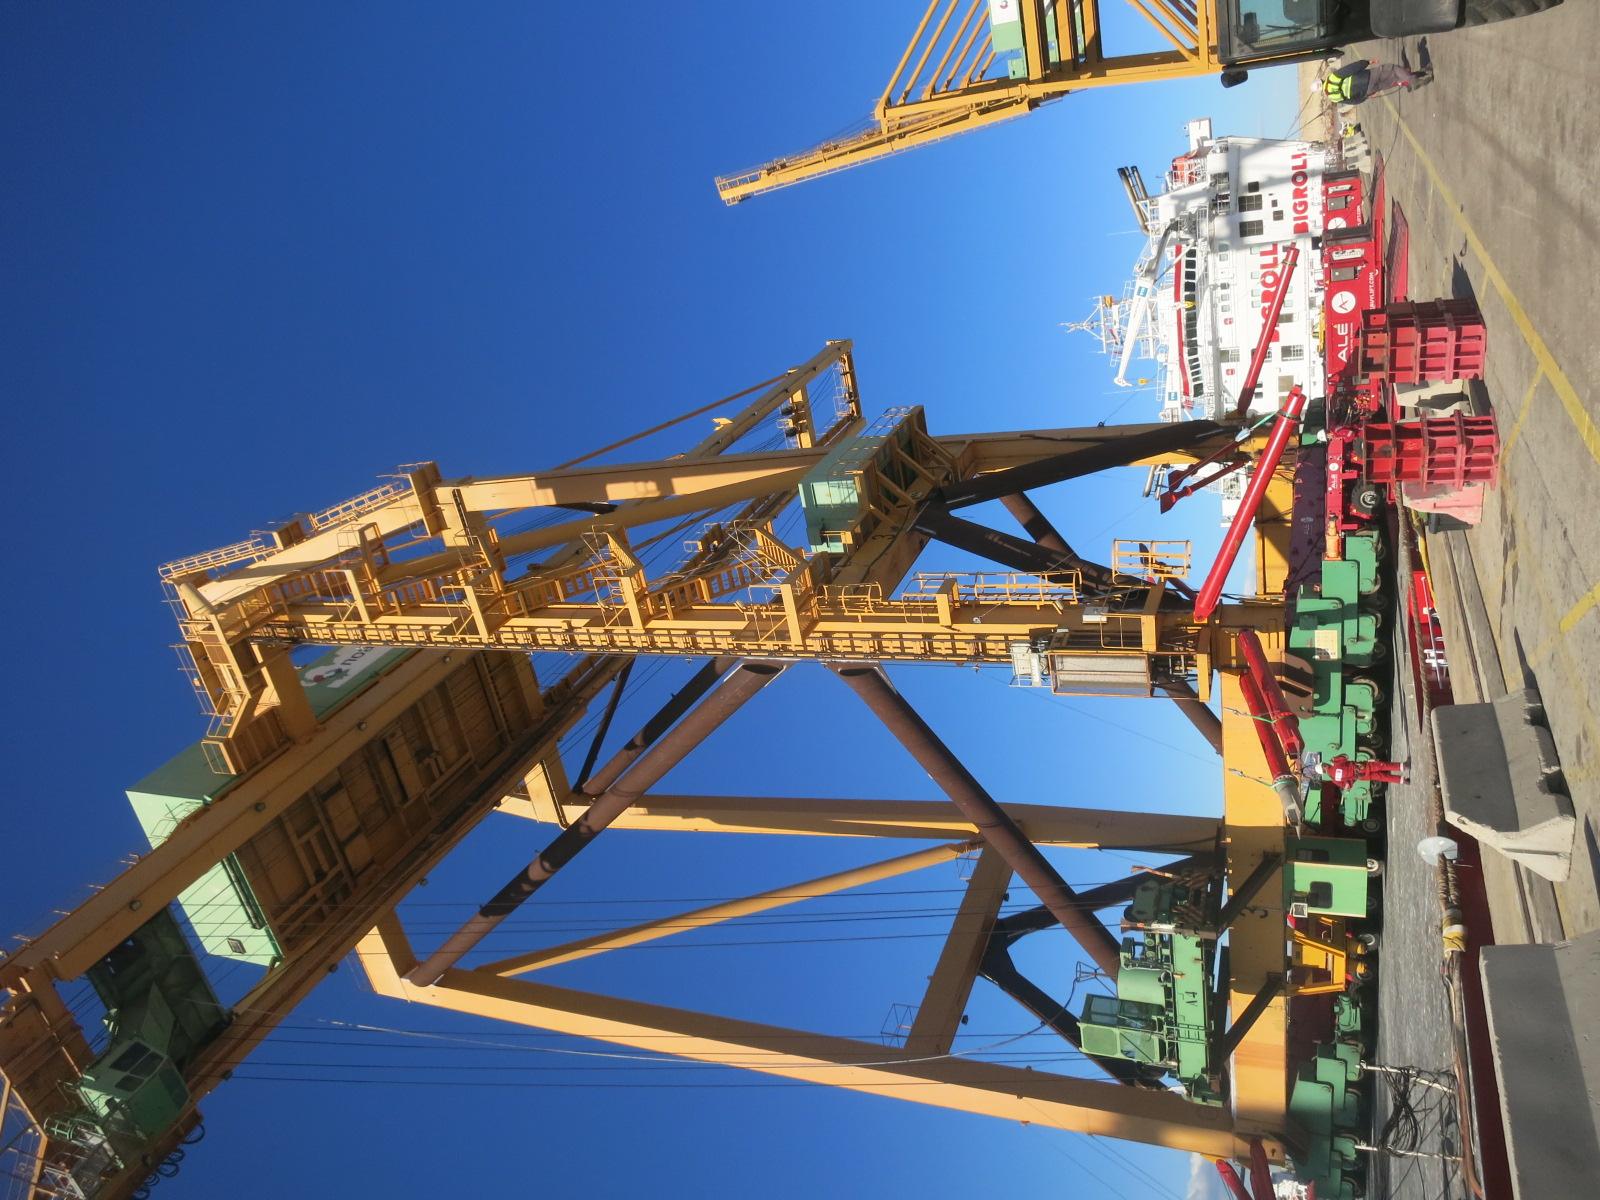 bms design marine surveyor engineers and